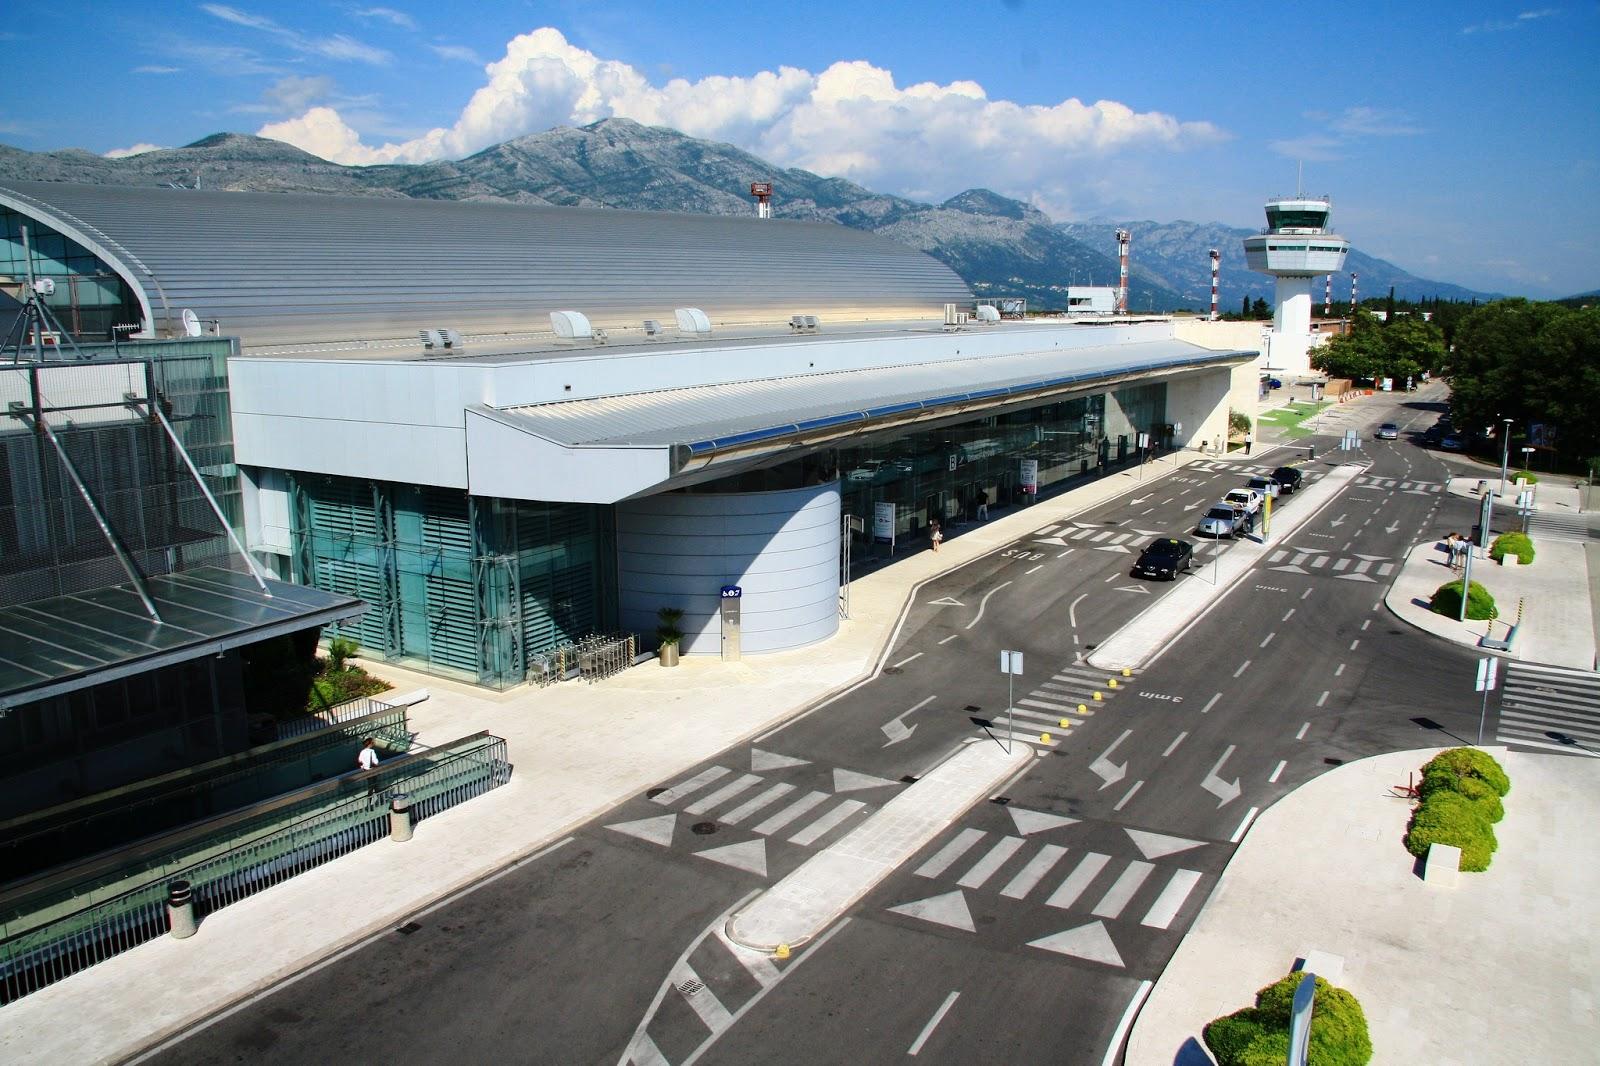 Nova Car Rental Dubrovnik